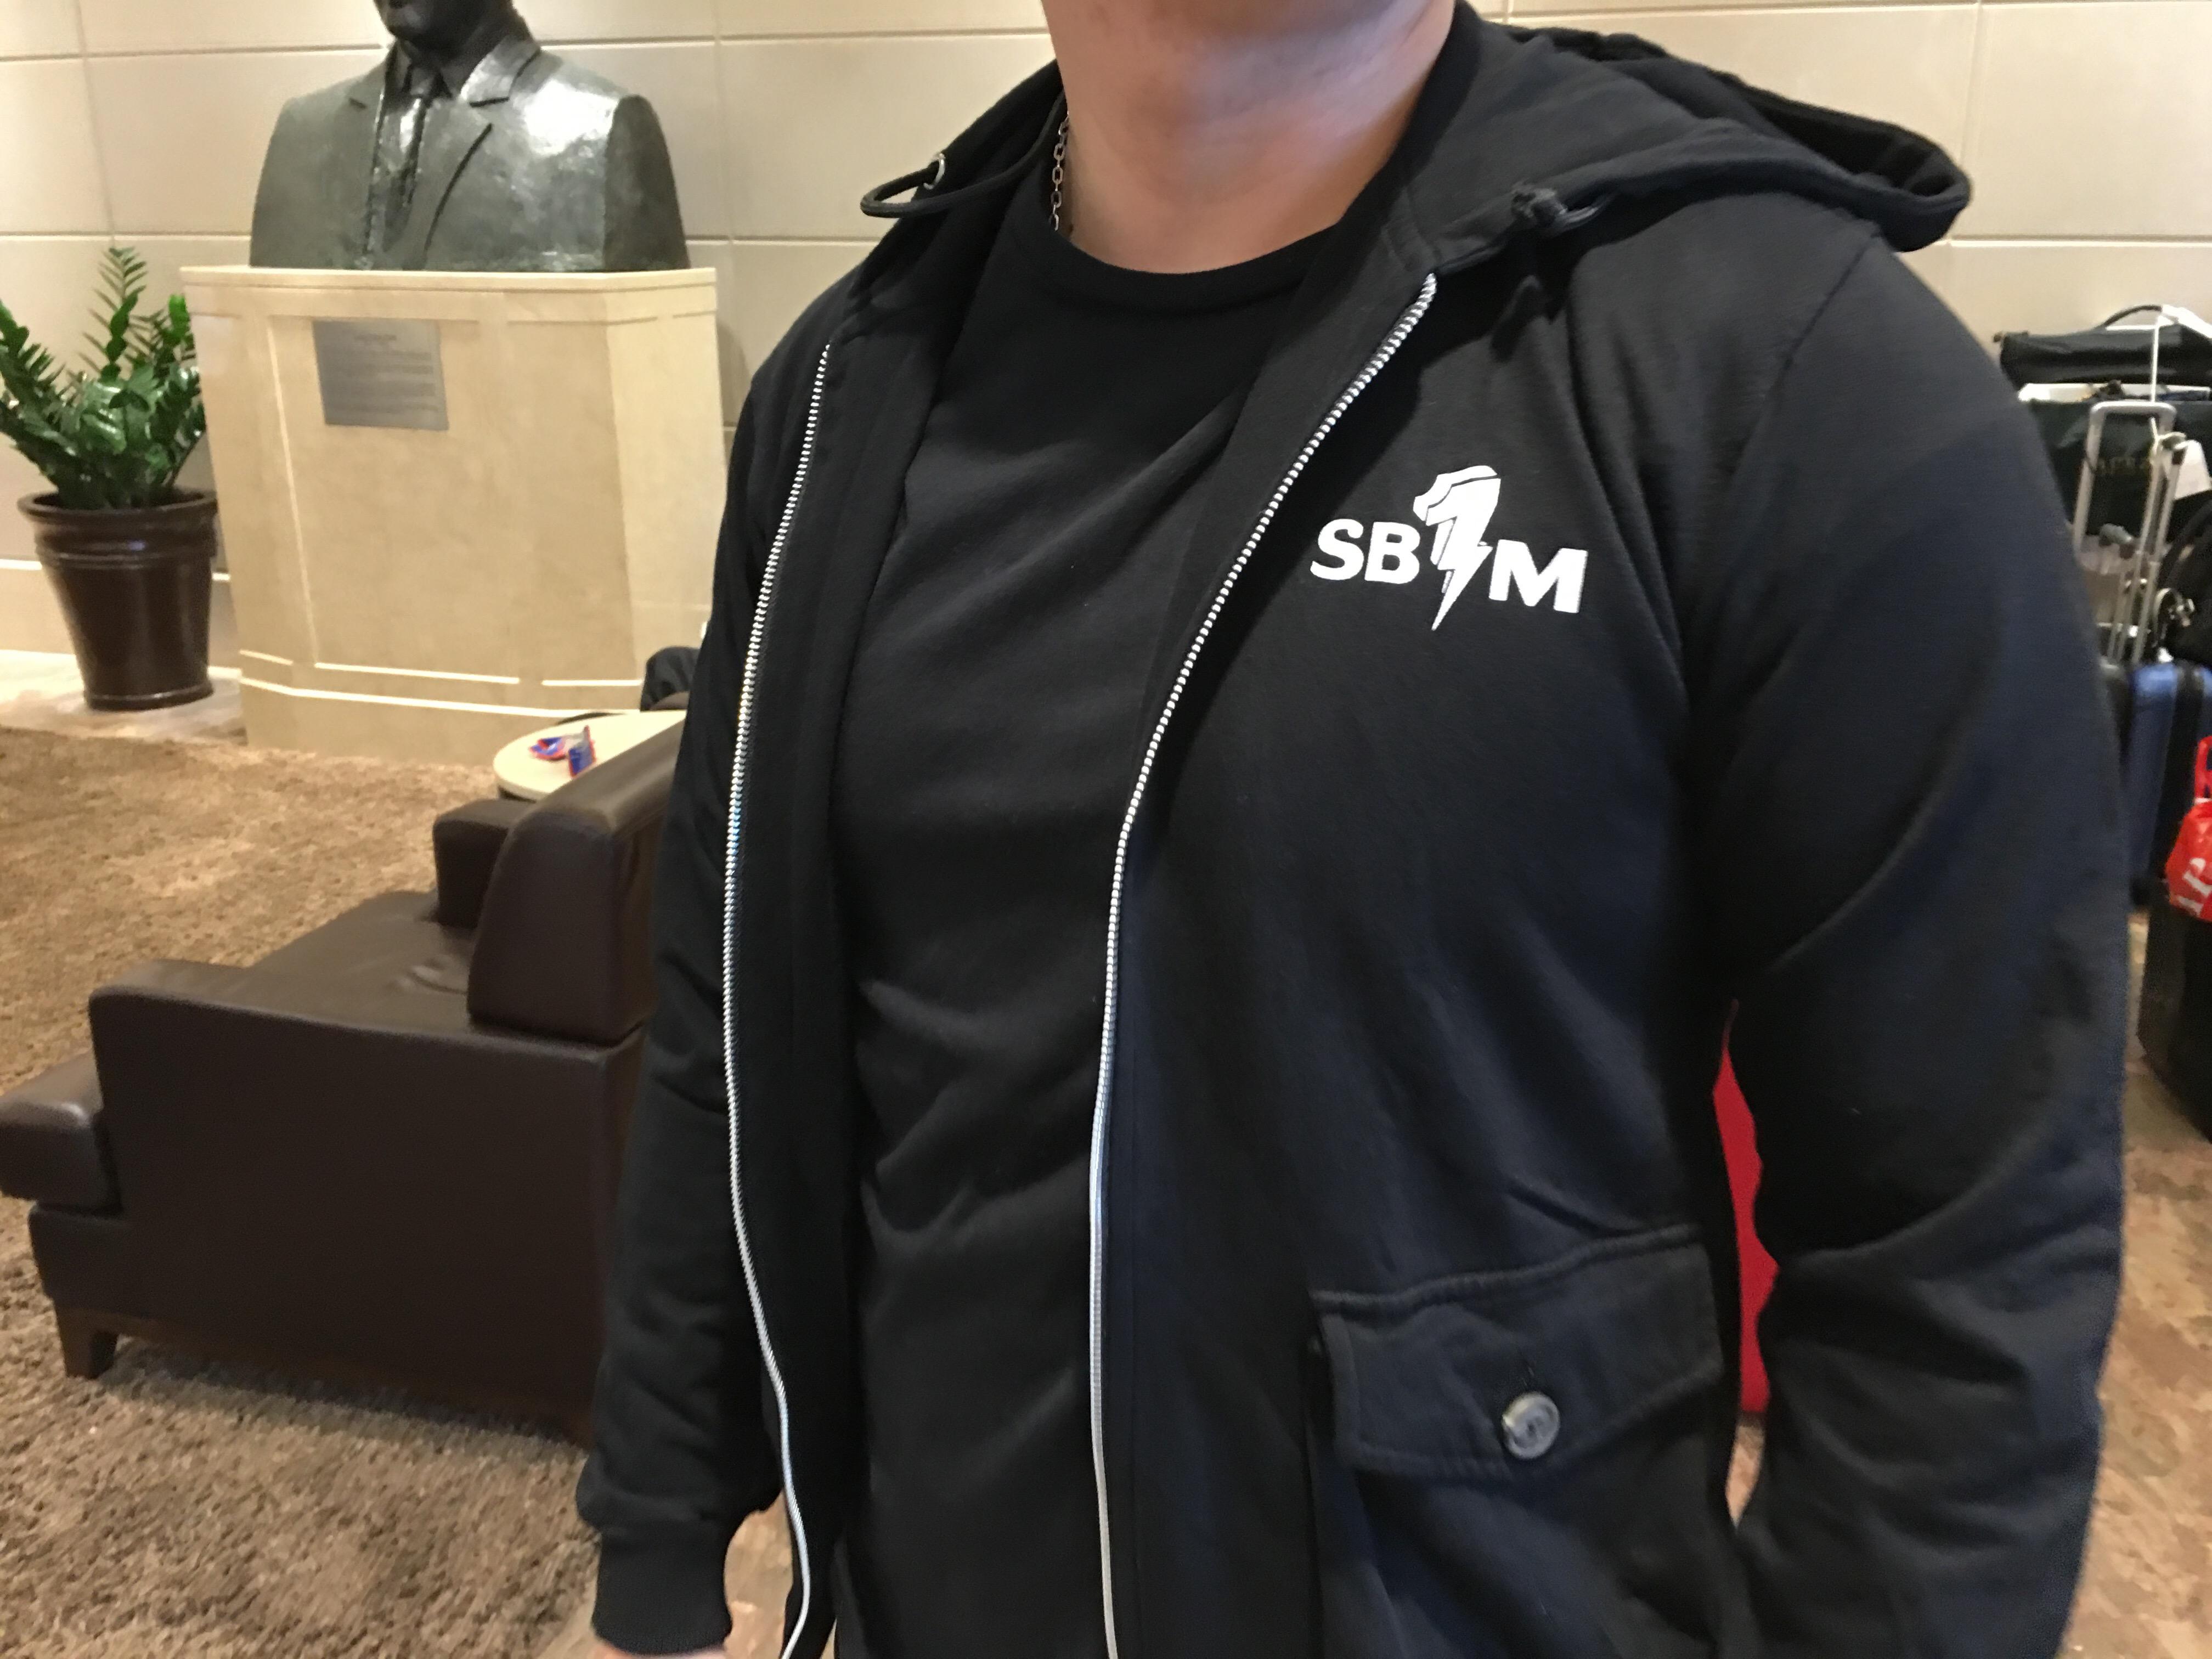 sb1m jacket